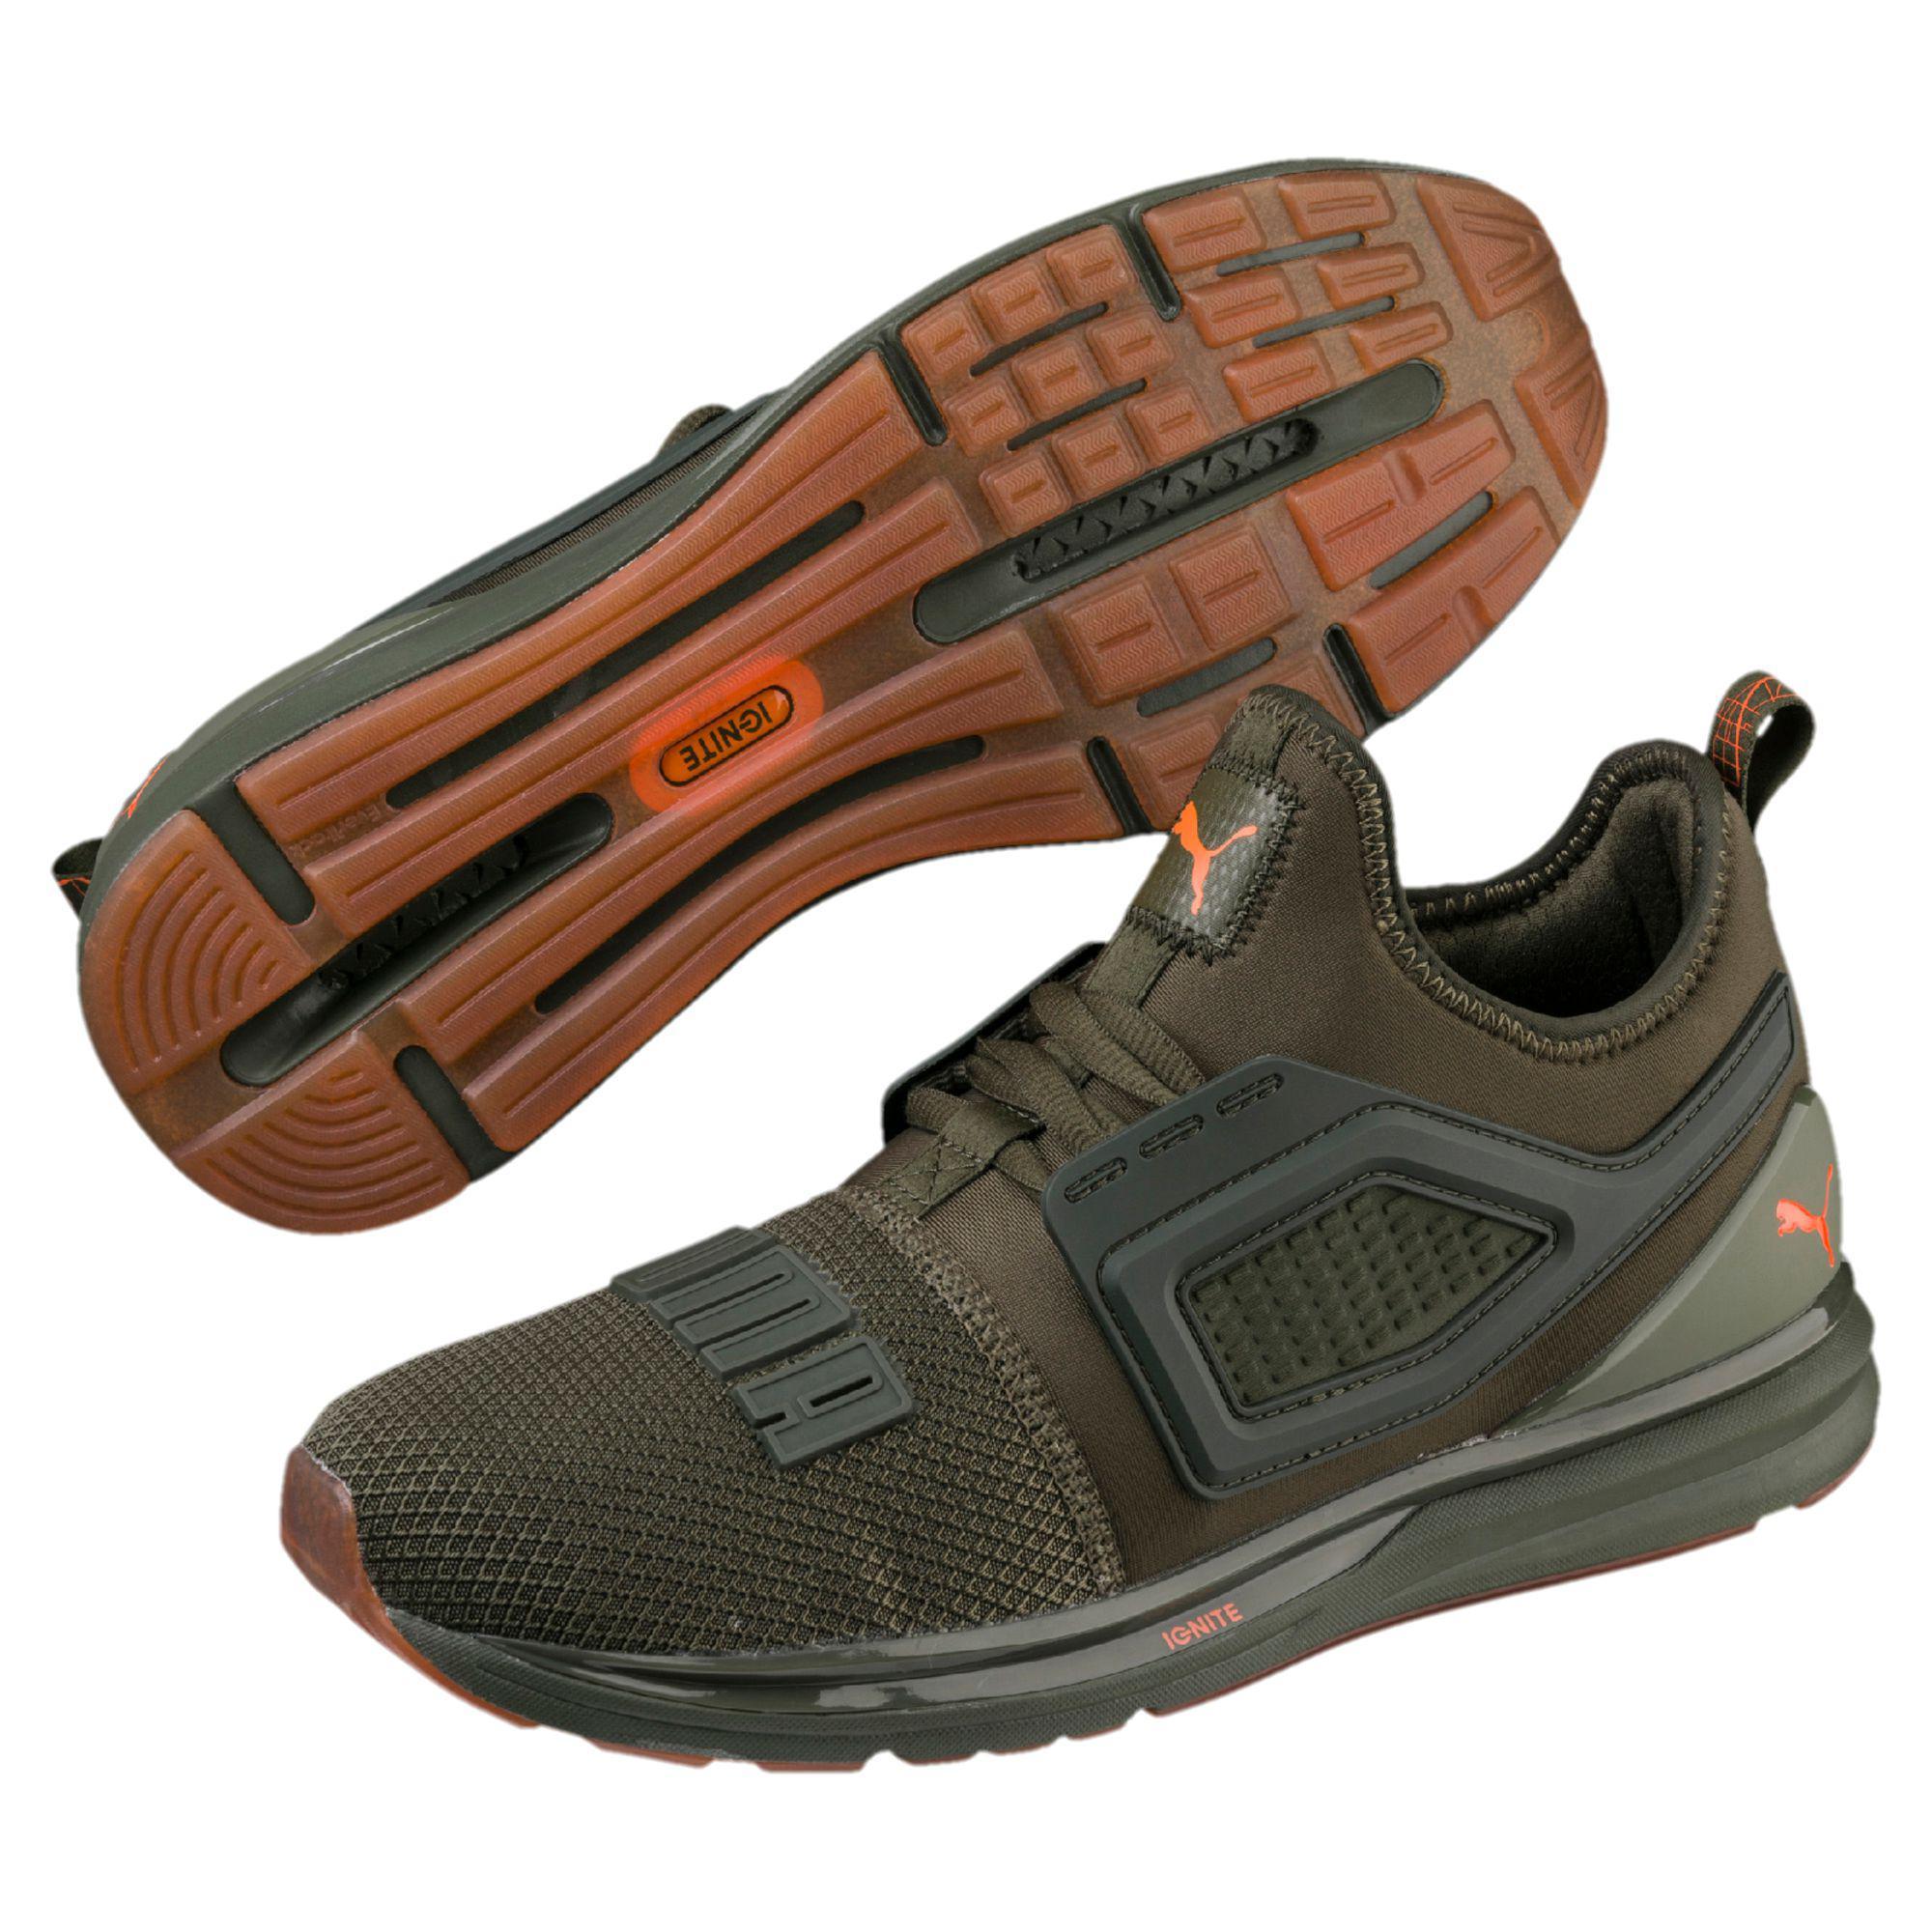 af4bebeefde3 PUMA - Multicolor Ignite Limitless 2 Unrest Running Shoes - Lyst. View  fullscreen